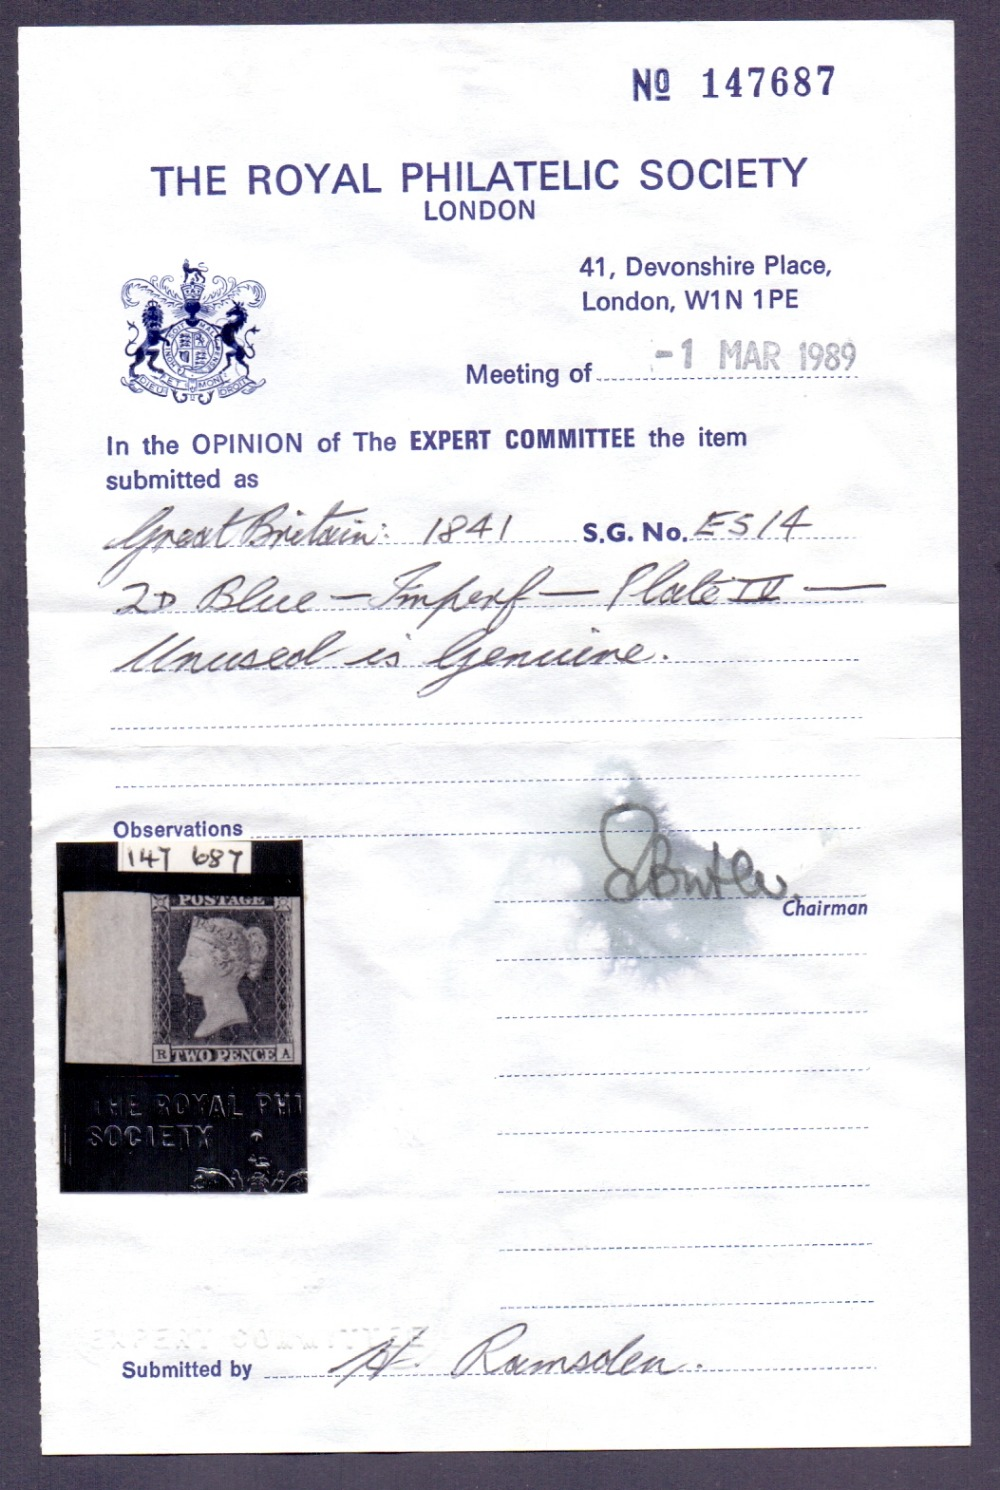 Lot 207 - GREAT BRITAIN STAMPS : 1841 2d Blue plat